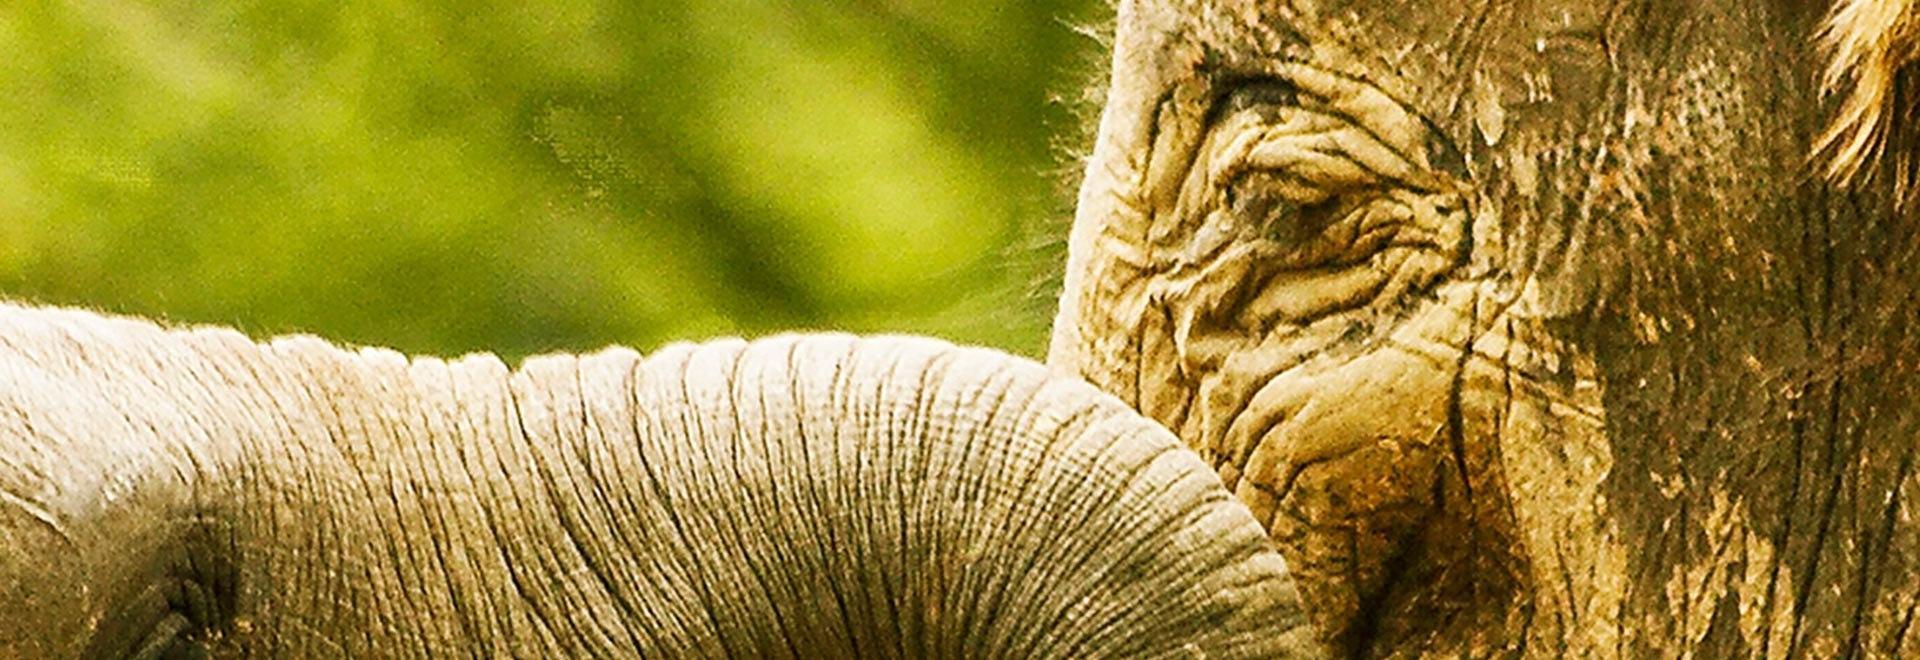 L'ospedale degli elefanti